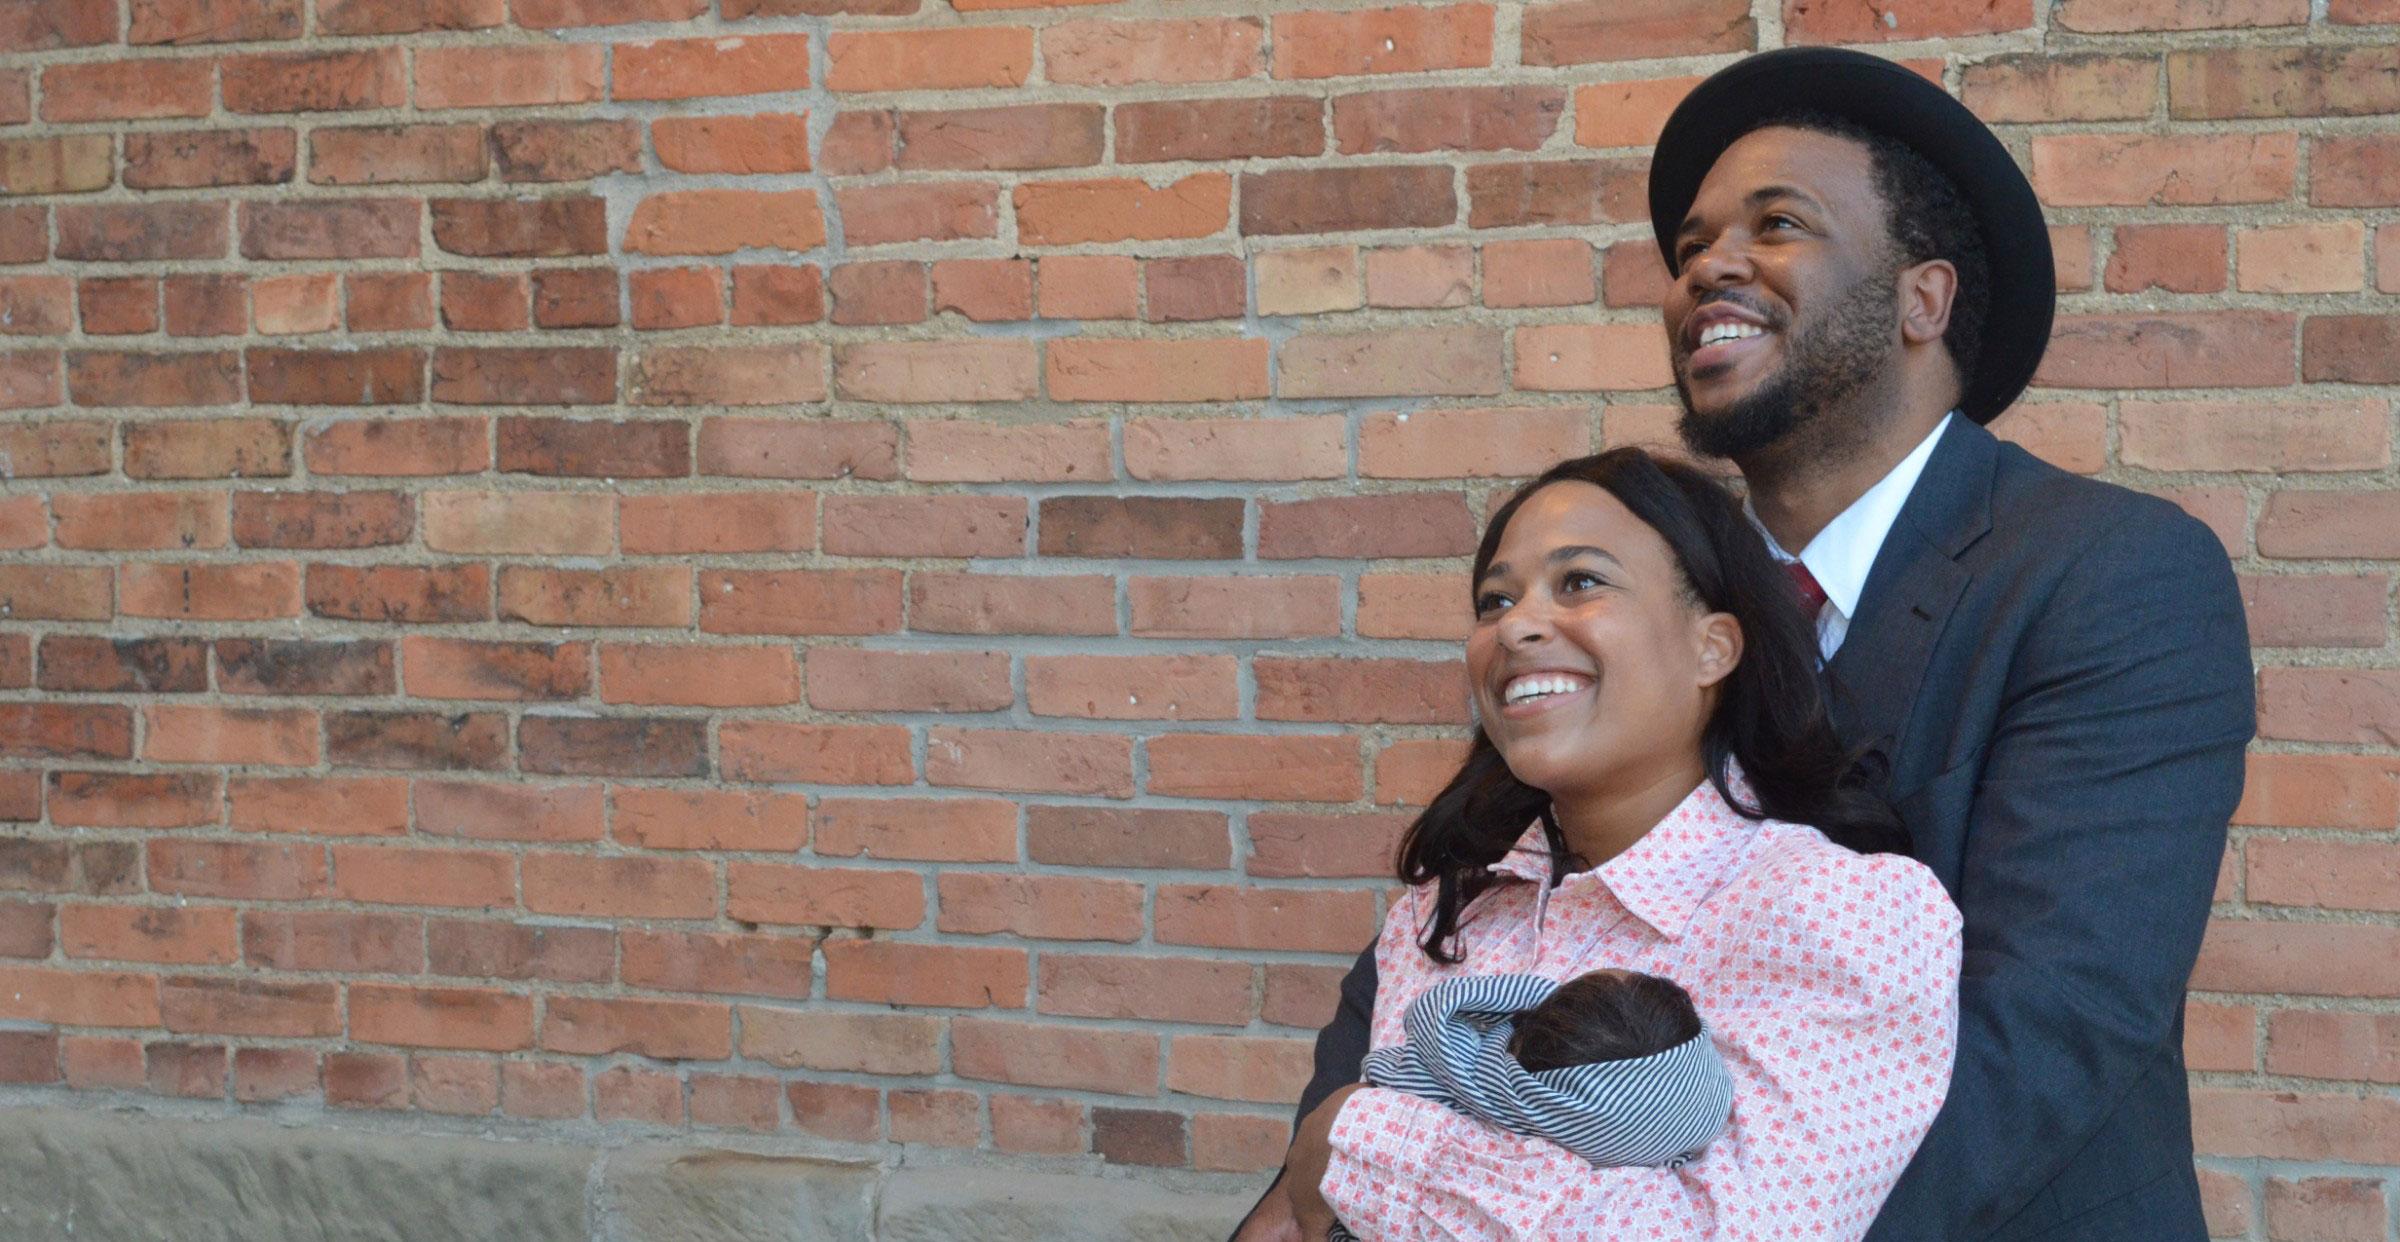 Nickolas Brown and Bryana Hall play Coalhouse Walker Jr. and Sarah in Ragtime.